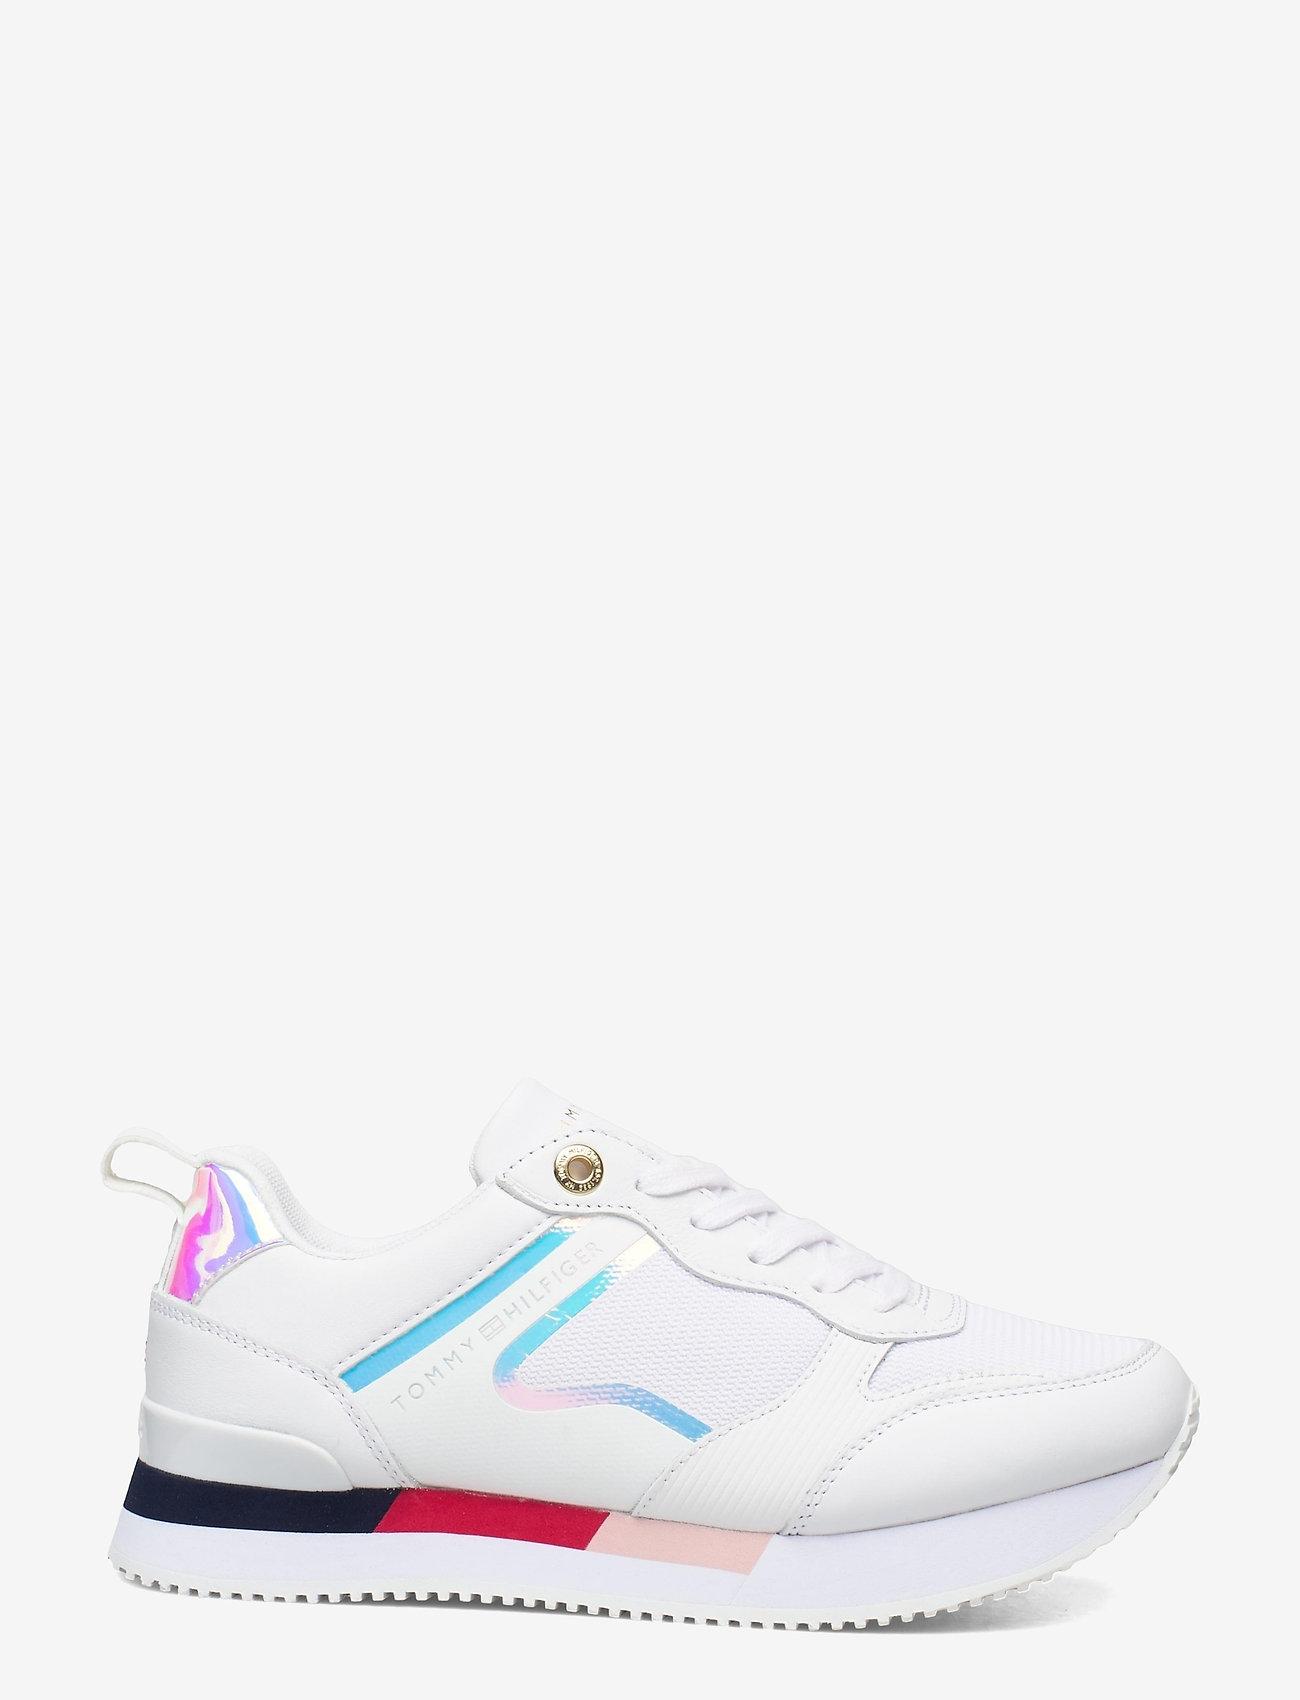 Tommy Hilfiger - FEMININE ACTIVE CITY SNEAKER - low top sneakers - rwb - 1